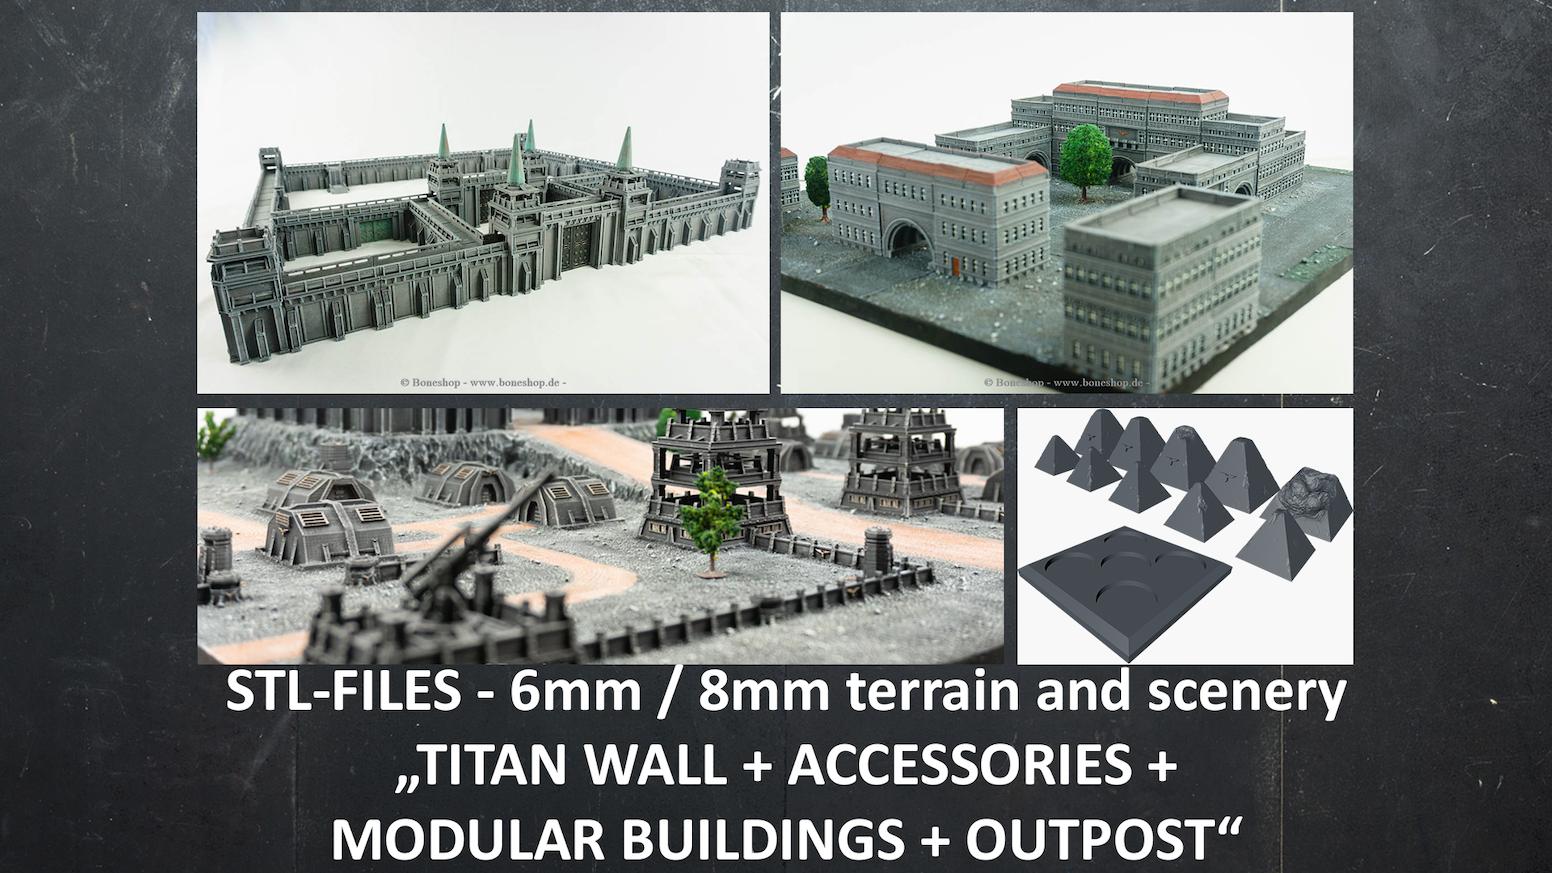 Support Free Stl 3d Printable 6mm 8mm Scenery And Terrain By Boneshop Kickstarter